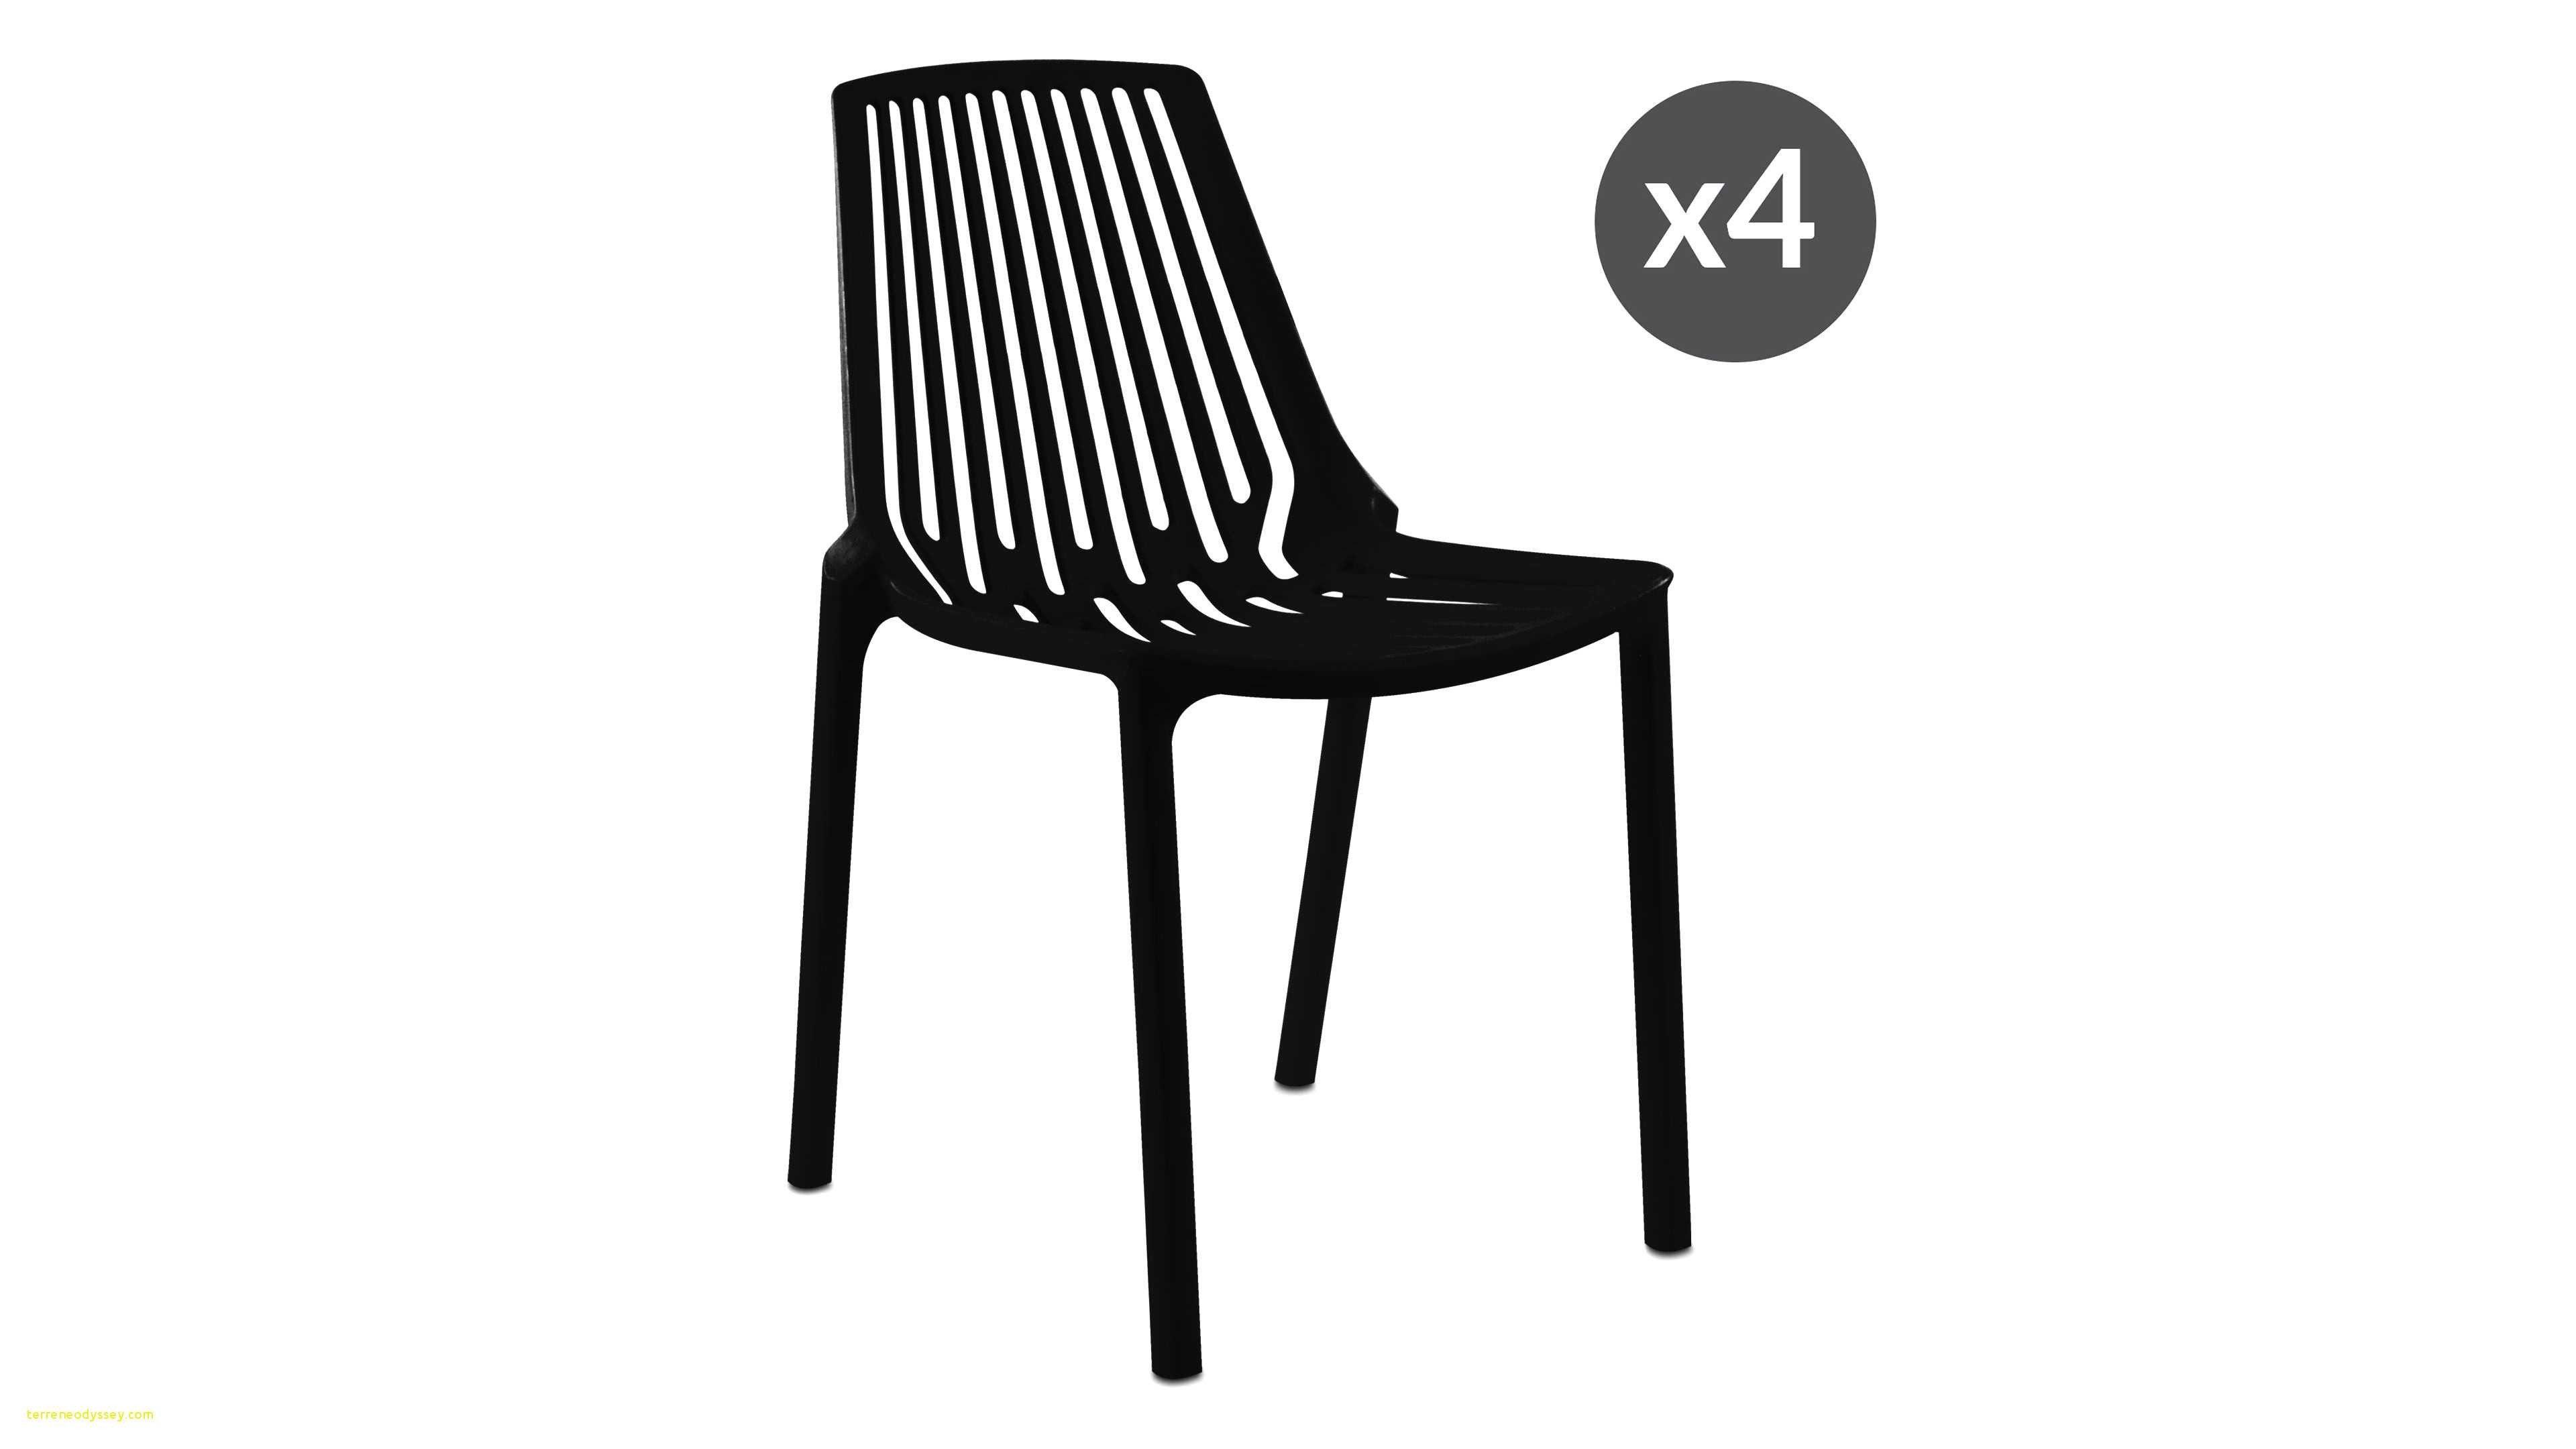 lit pas cher conforama joli frais lit gigogne metal. Black Bedroom Furniture Sets. Home Design Ideas